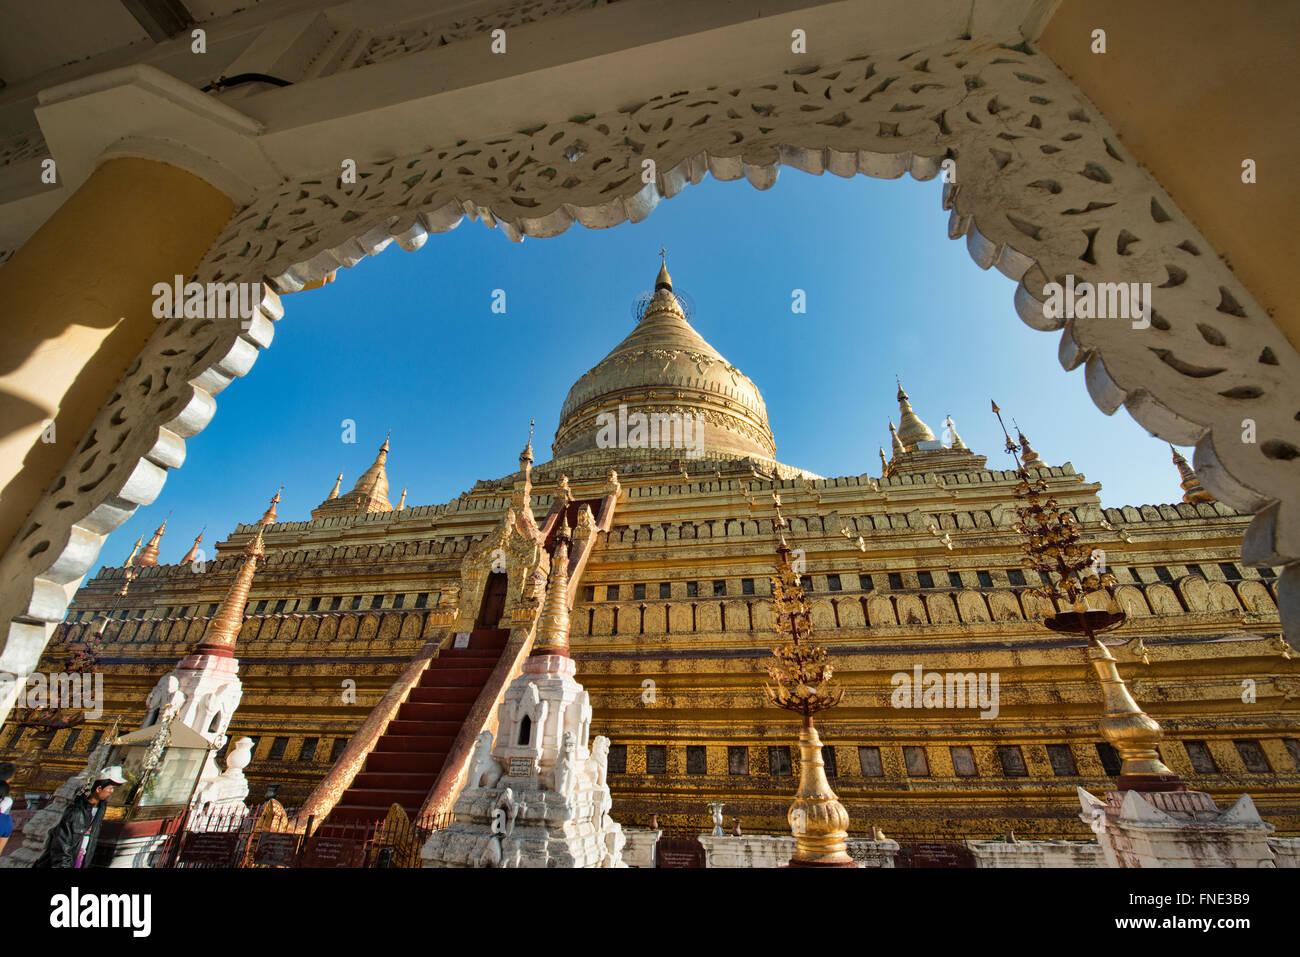 The ornate golden Shwezigon Pagoda, Bagan, Myanmar Stock Photo